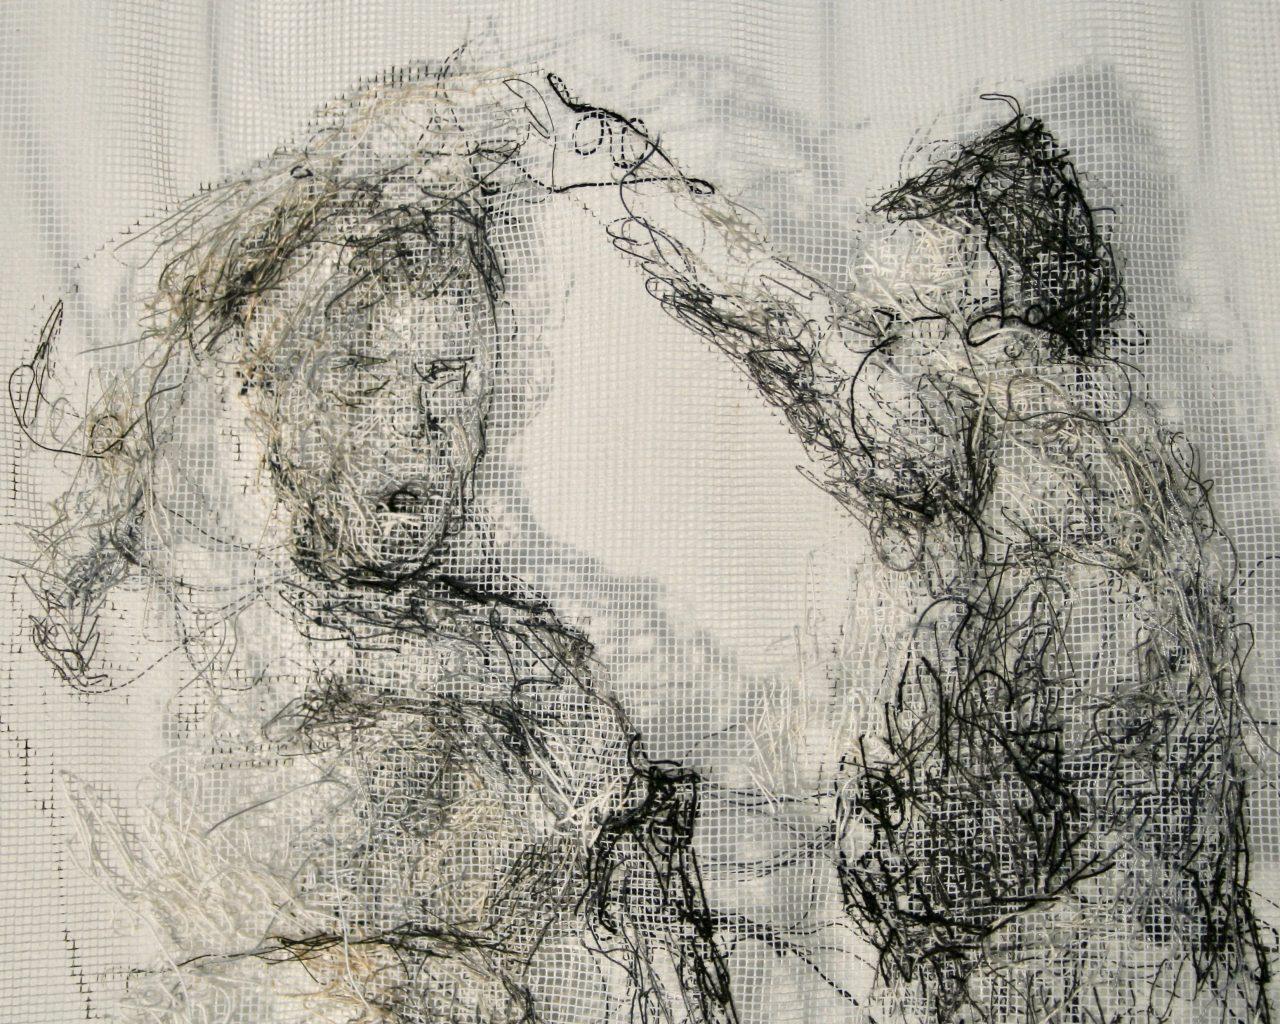 two women, threads/curtain, 60cm x 55cm